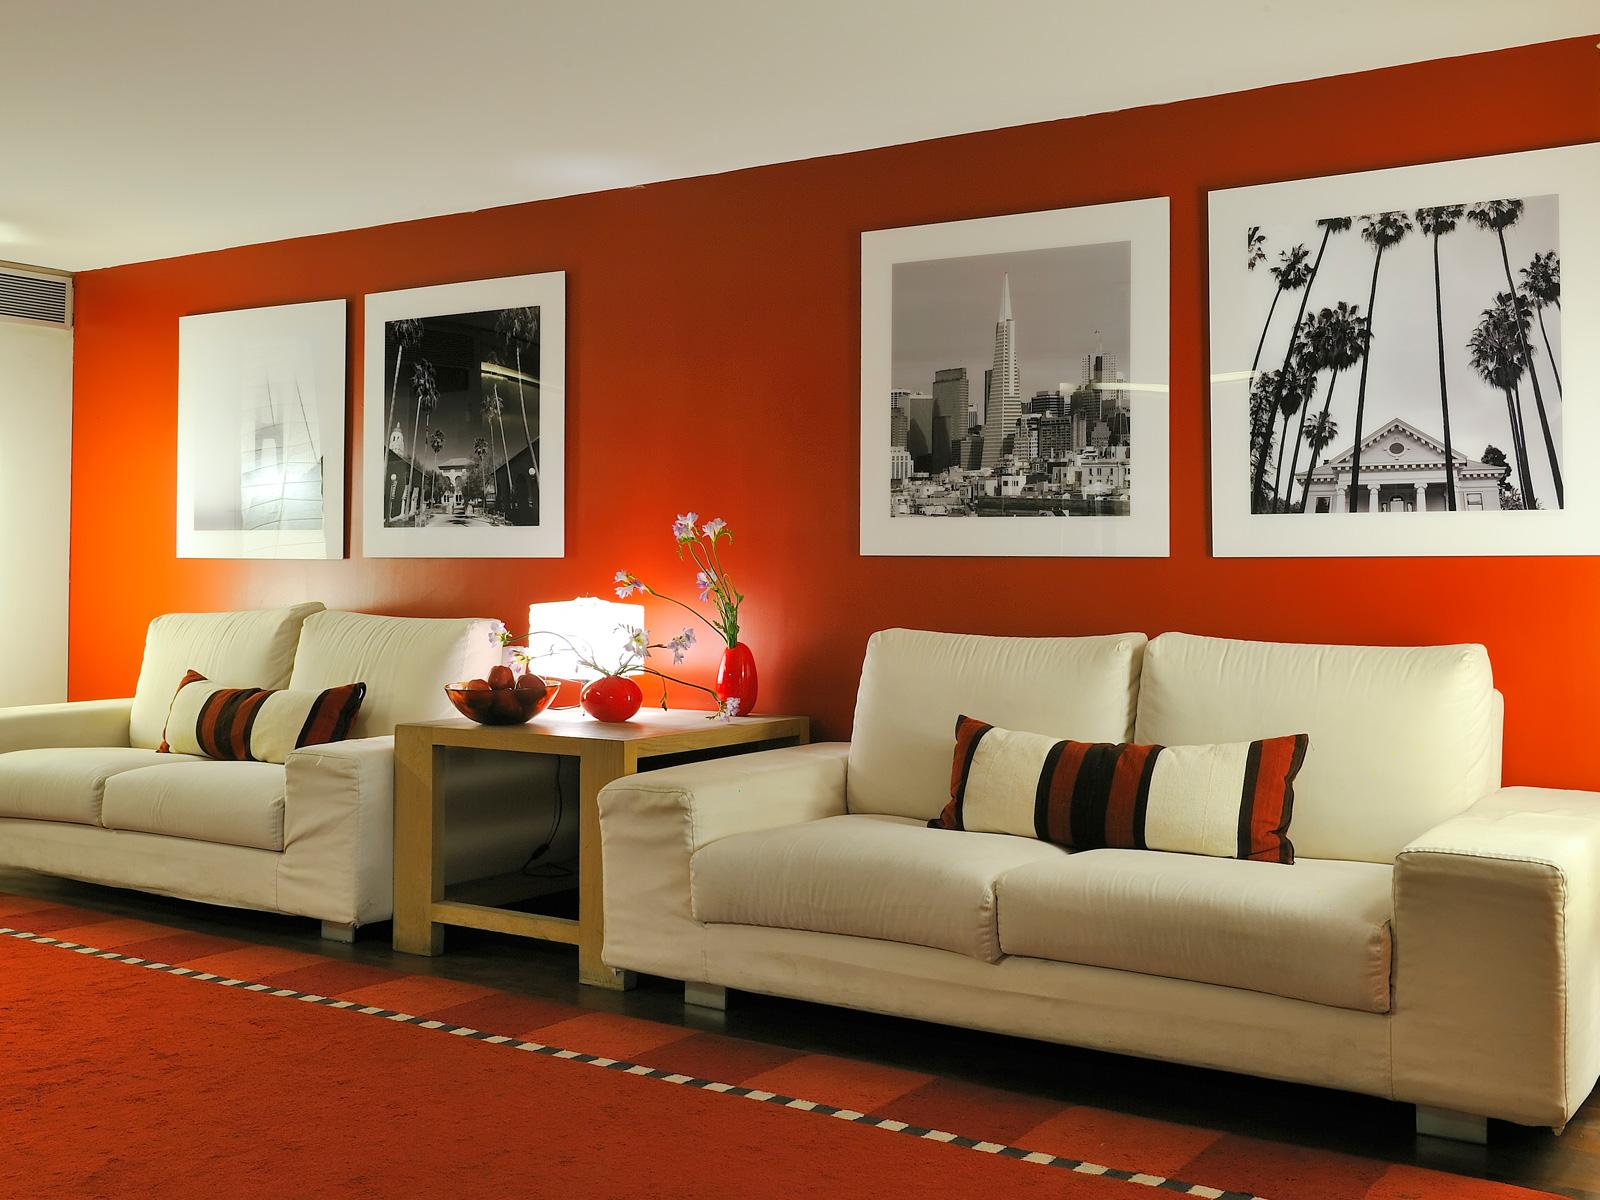 Vincci Soma 4* - Vincci Hoteles Madrid